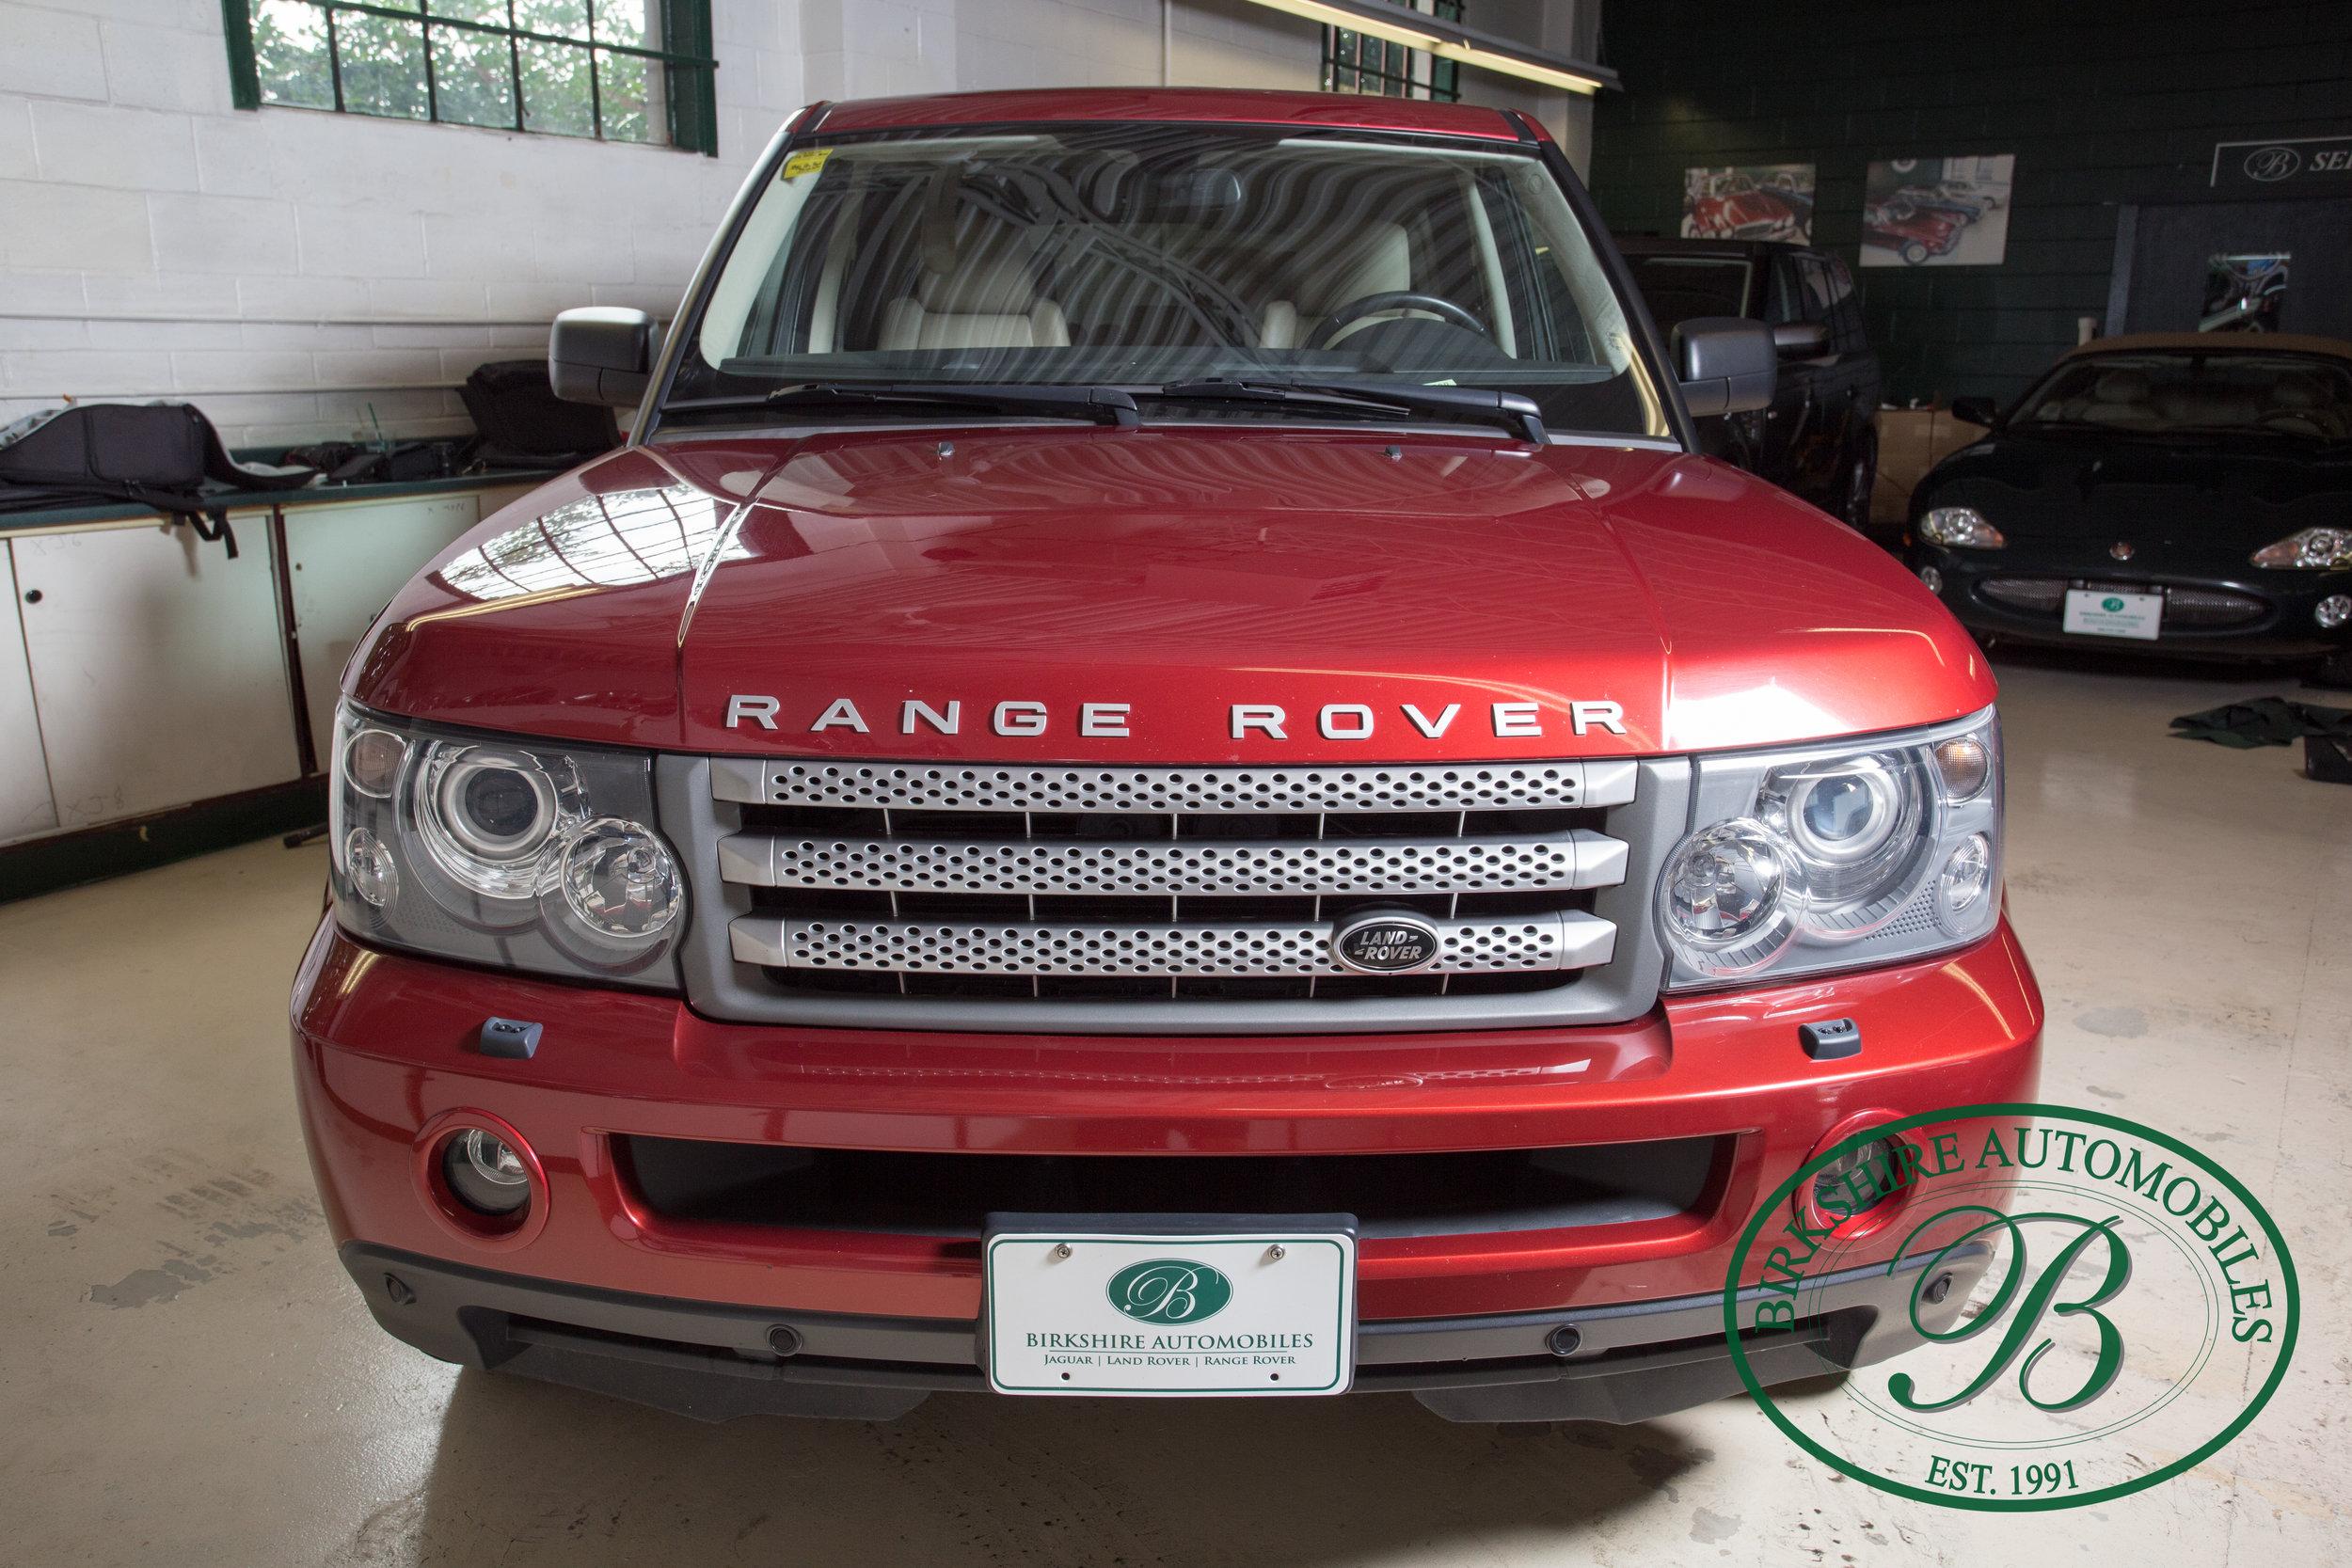 Birkshire Automobiles 2009 Range Rover Burgundy-9.jpg